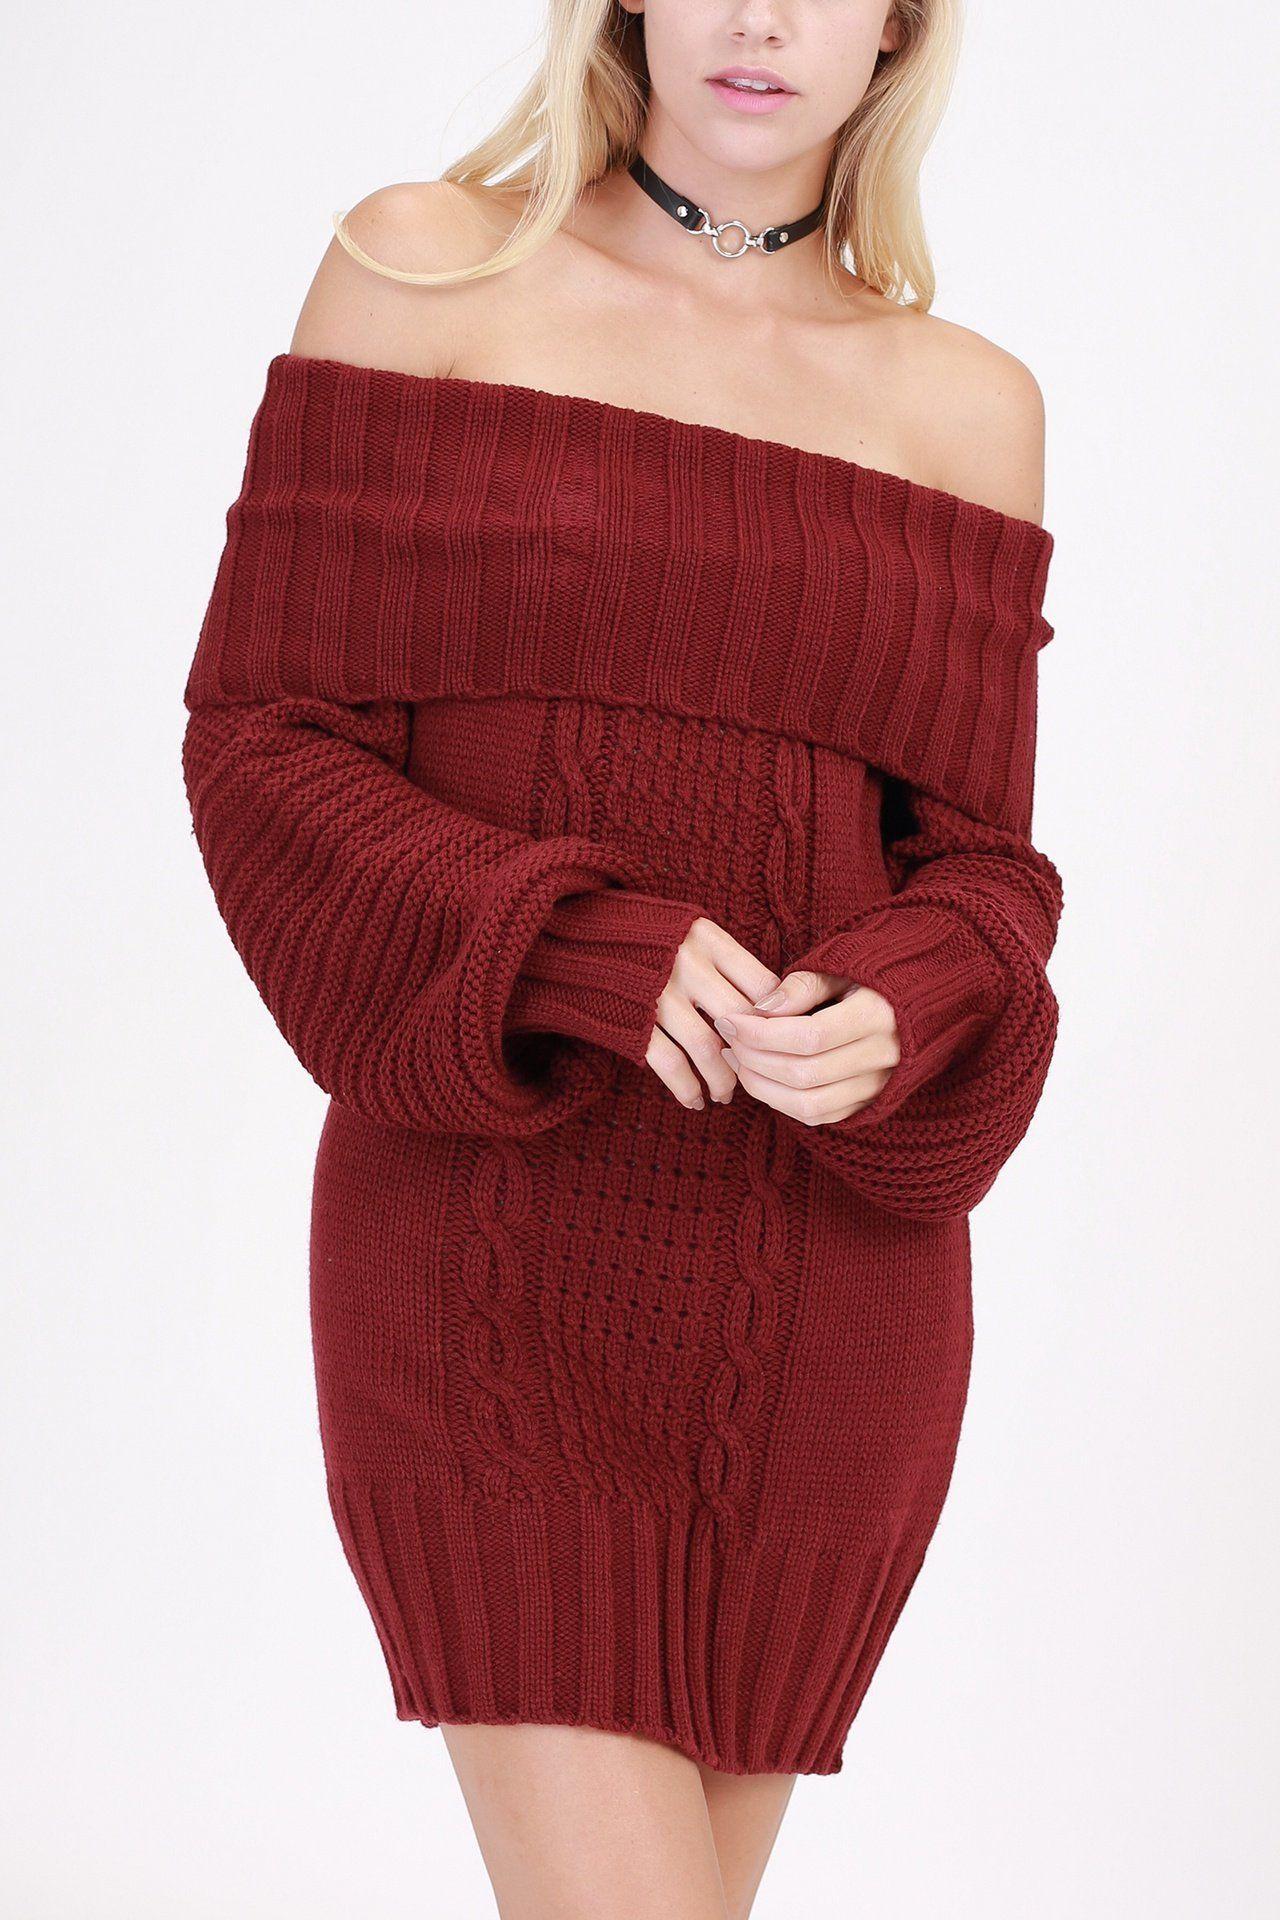 29++ Off shoulder sweater dress ideas